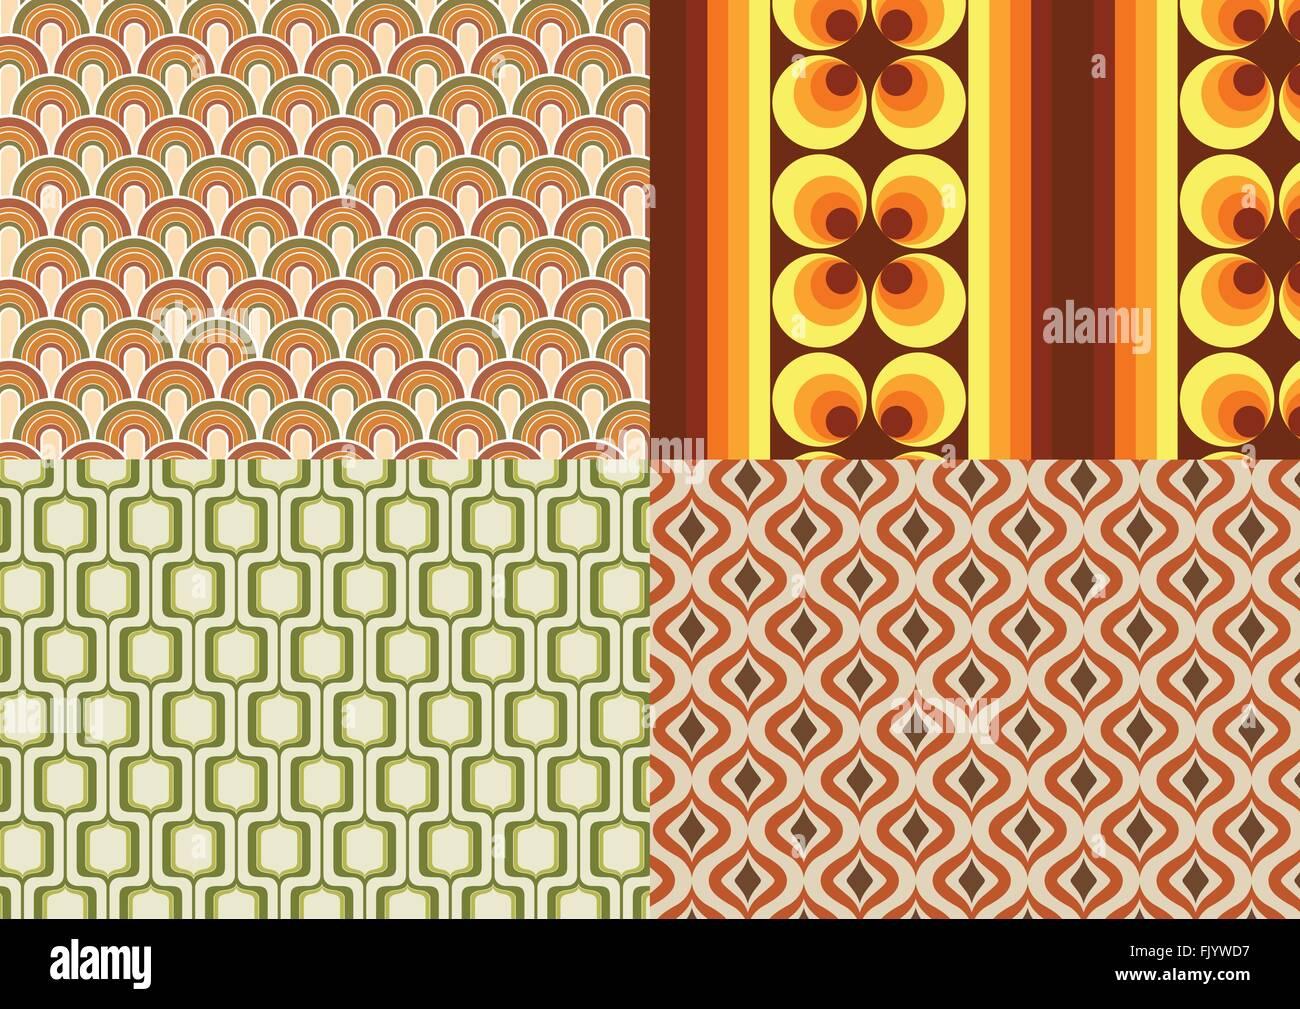 Seventies wallpapers - Stock Image